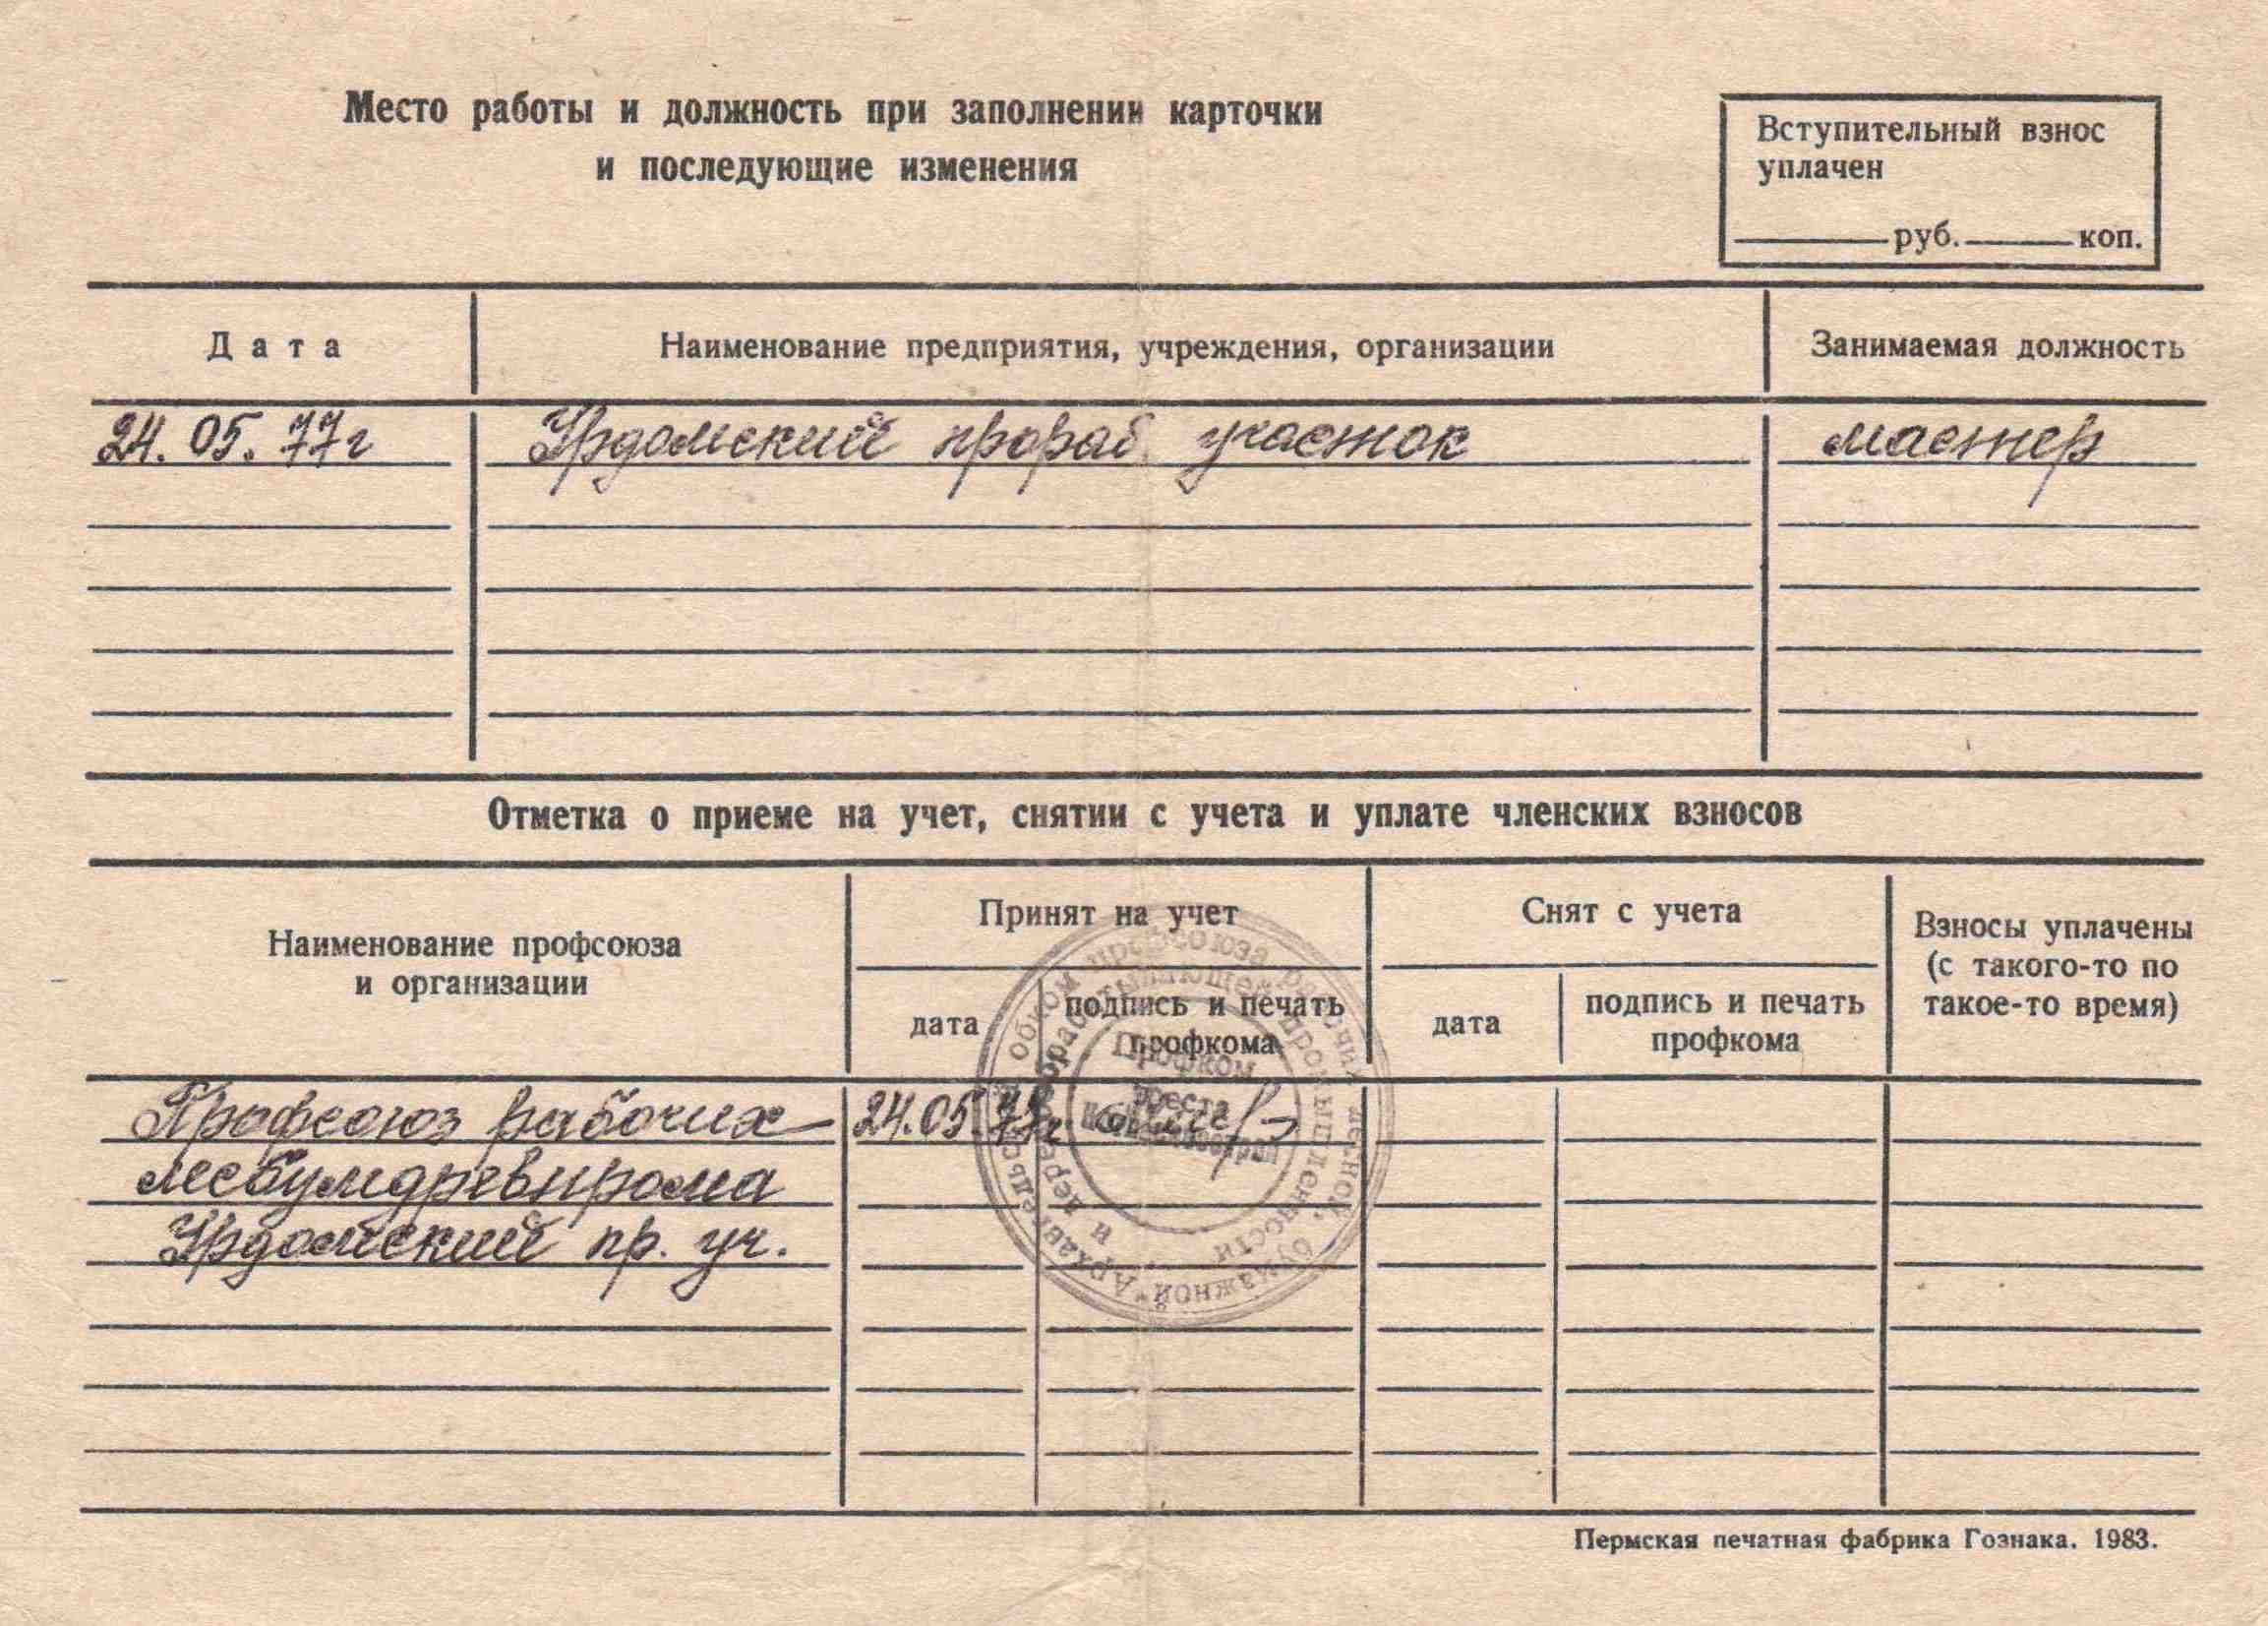 13. Учетная карточка члена профсоюза, 2